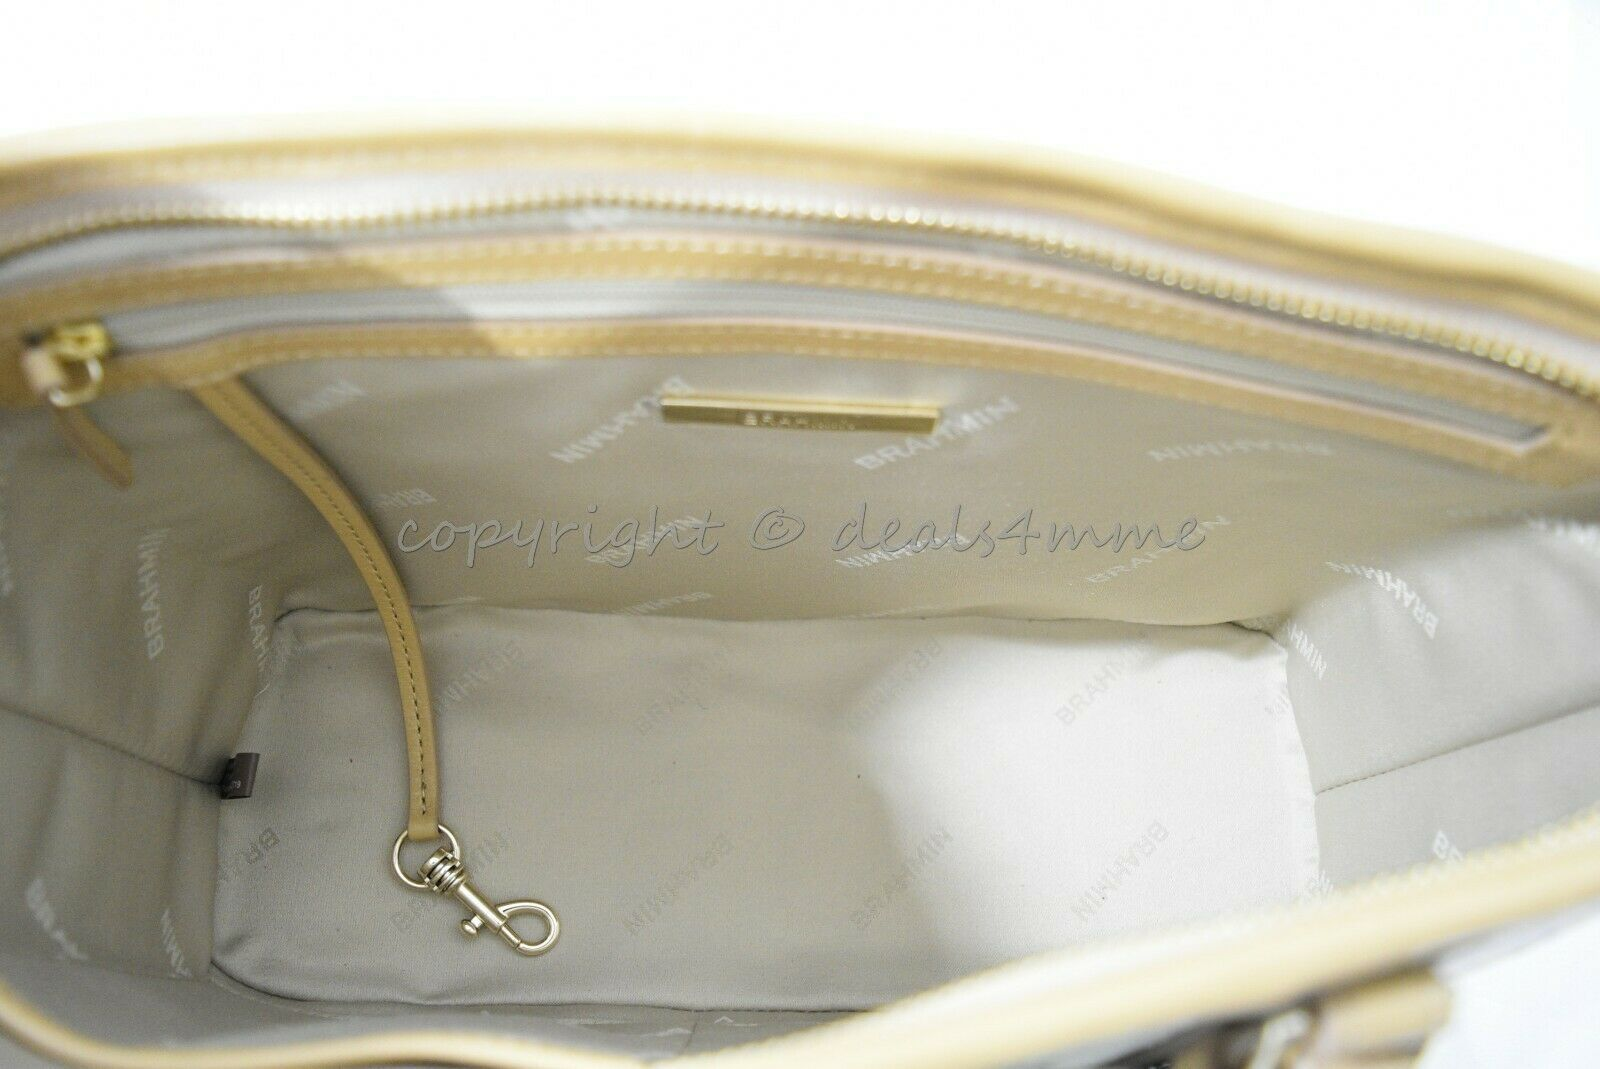 NWT Brahmin Mini Asher Leather Satchel/Shoulder Bag in Multi Pompano image 6